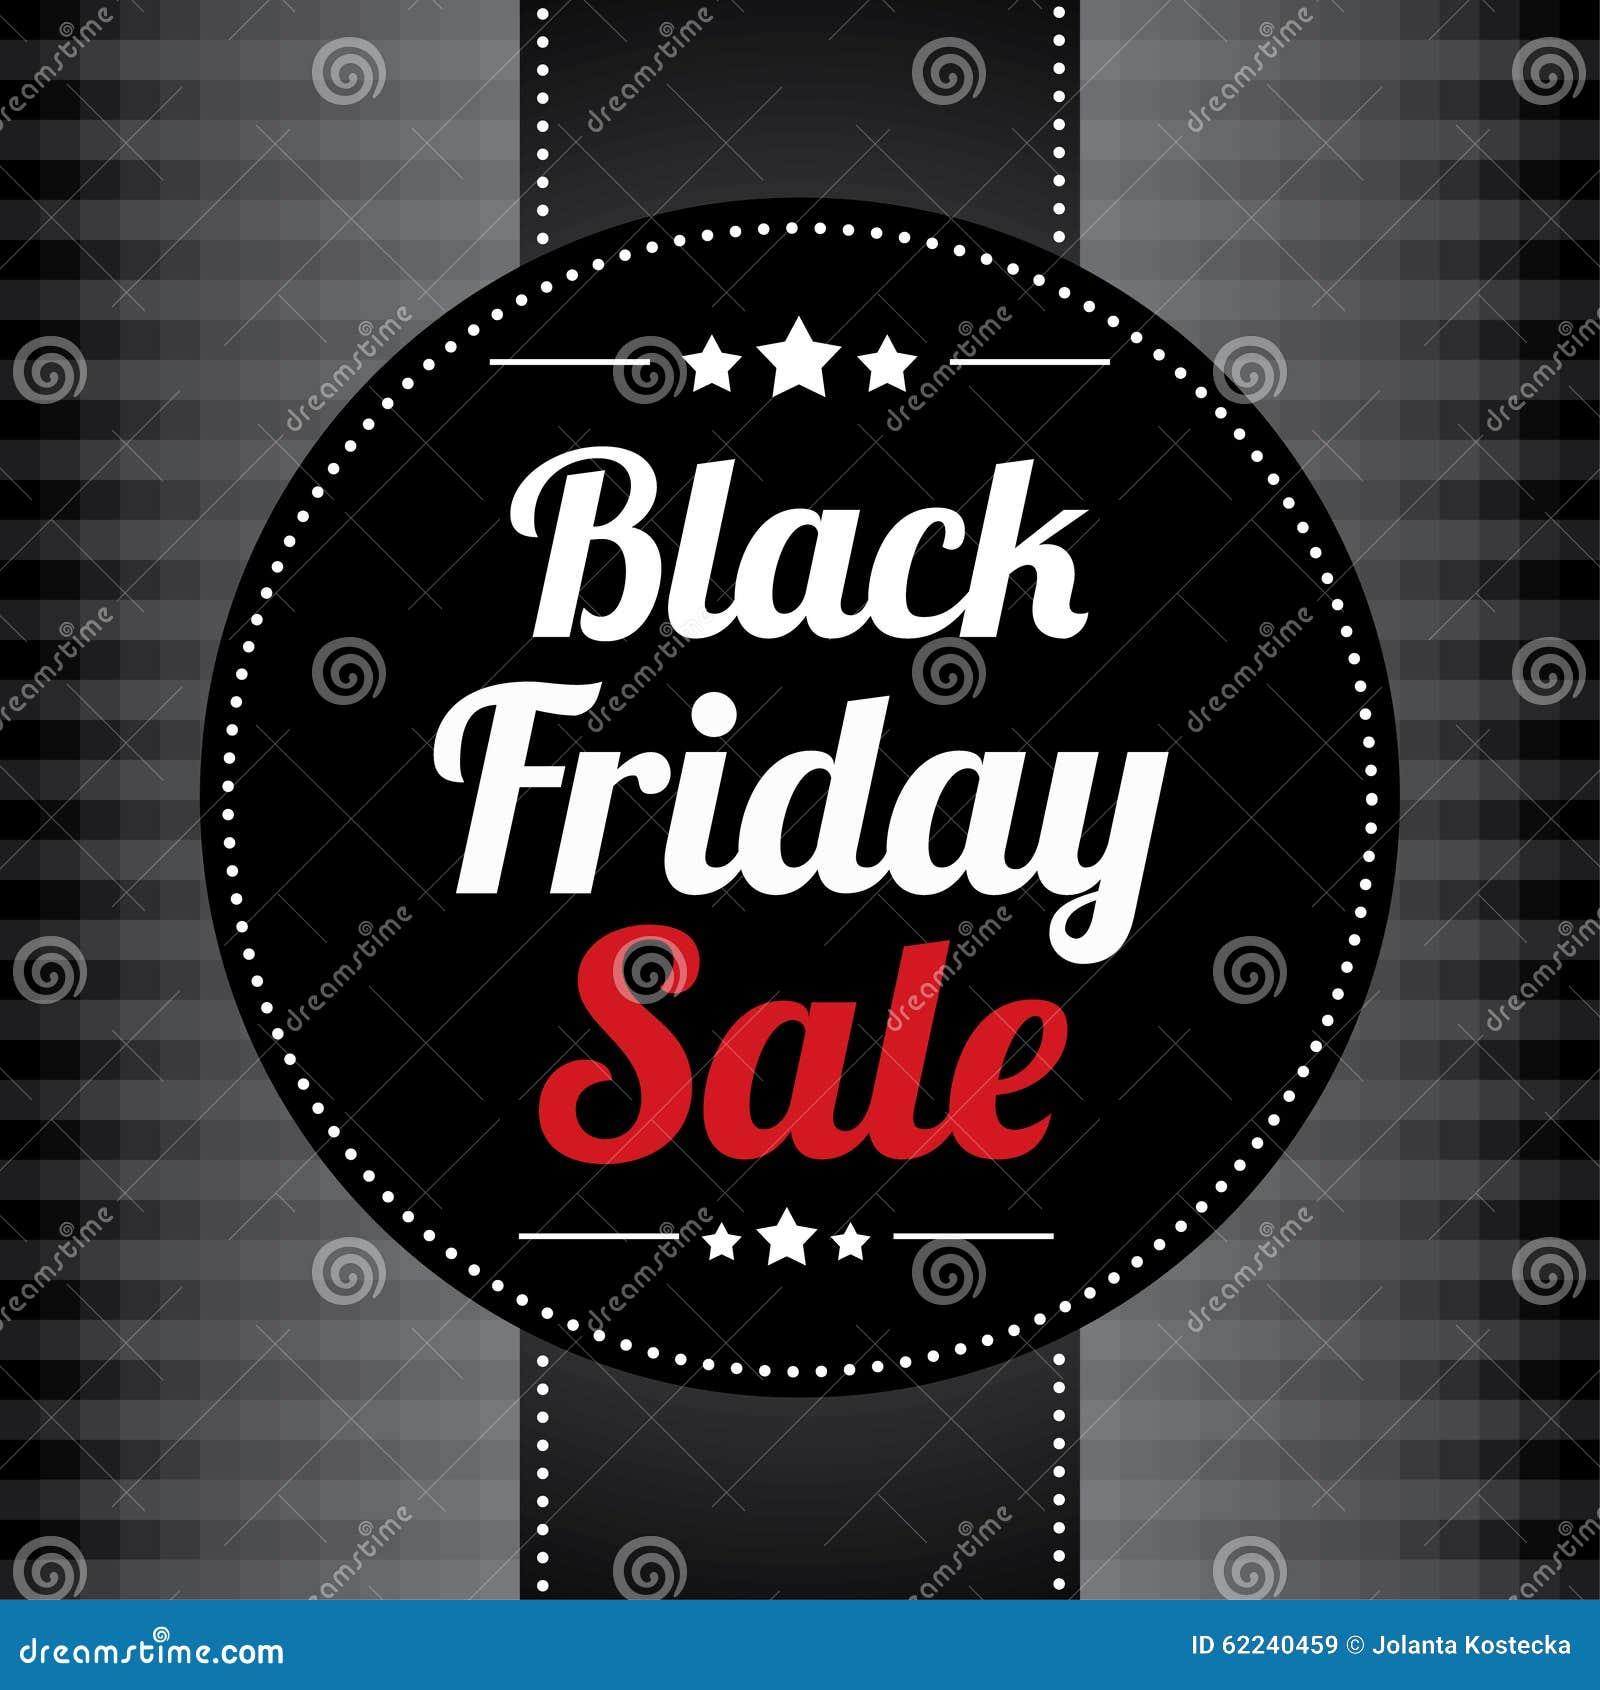 black friday sale poster stock vector  illustration of